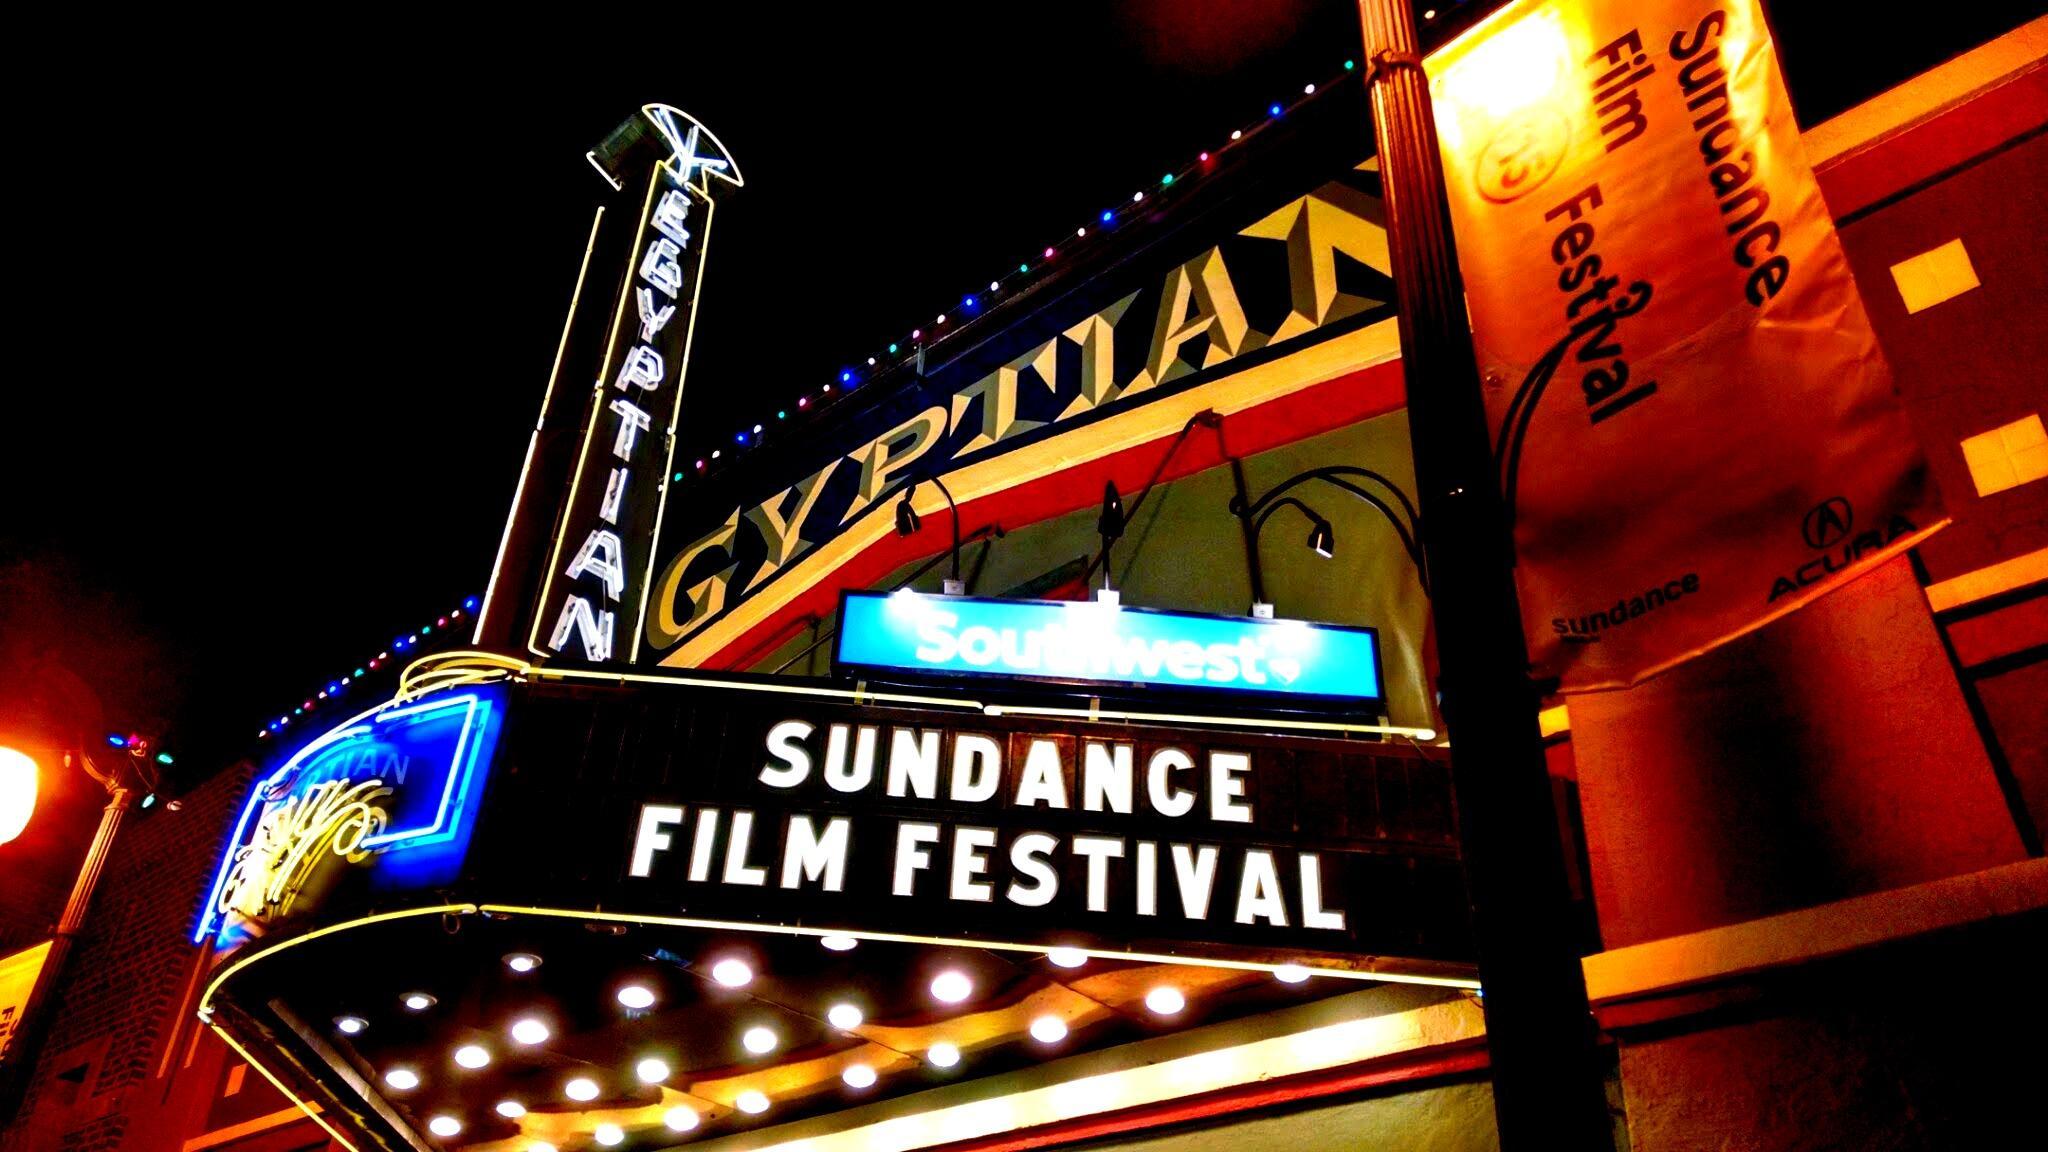 At the sundance film festival and its sister festival slamdance